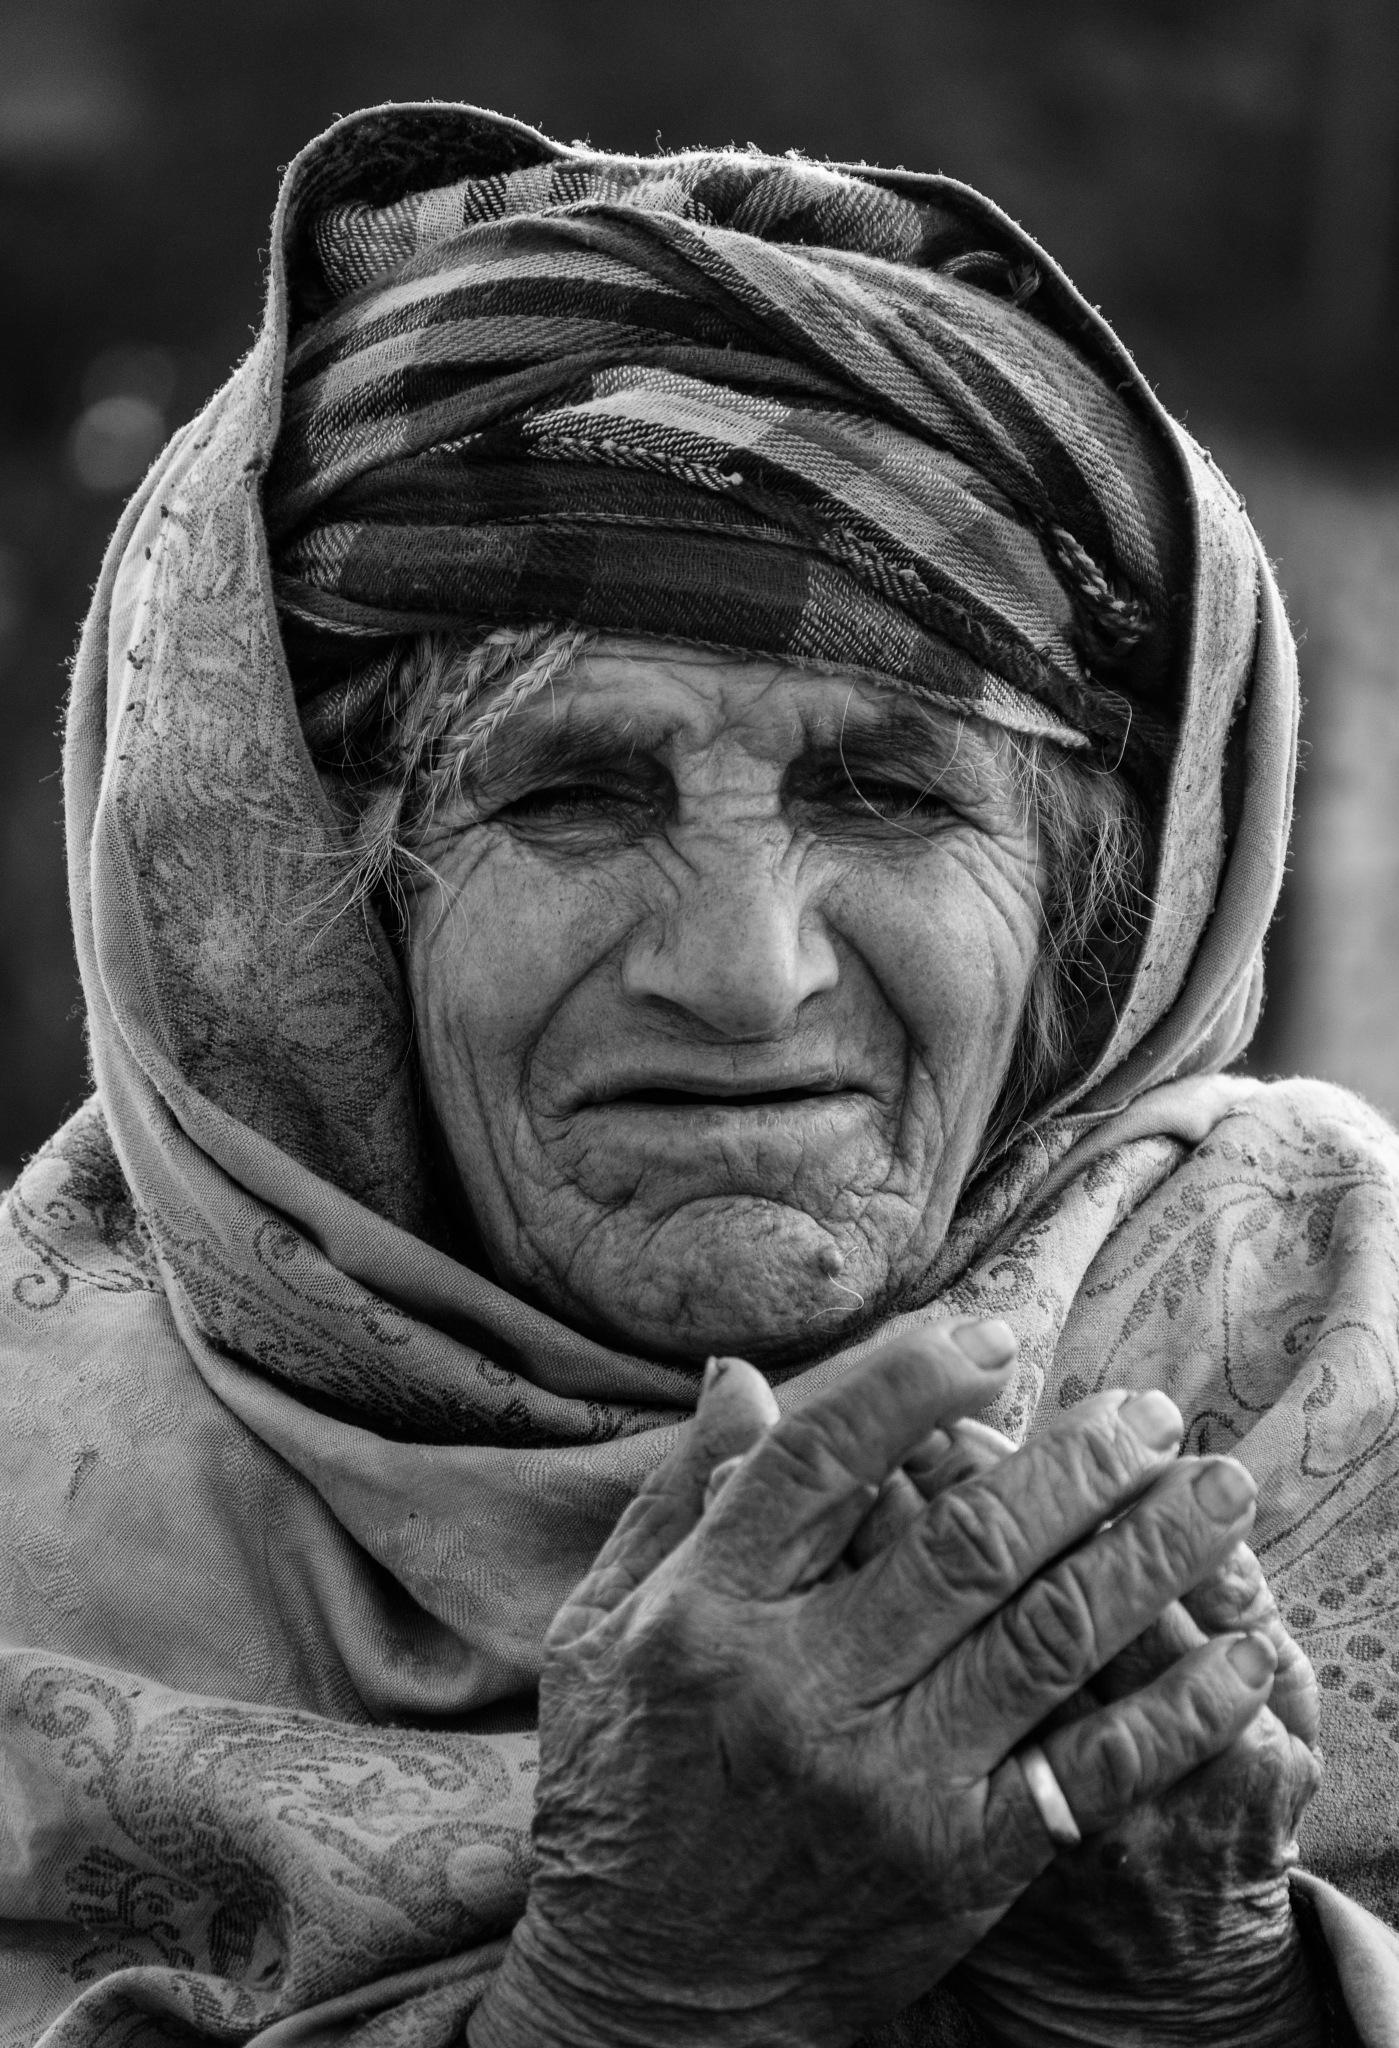 Prayers of the Old by Rahim Jiwani